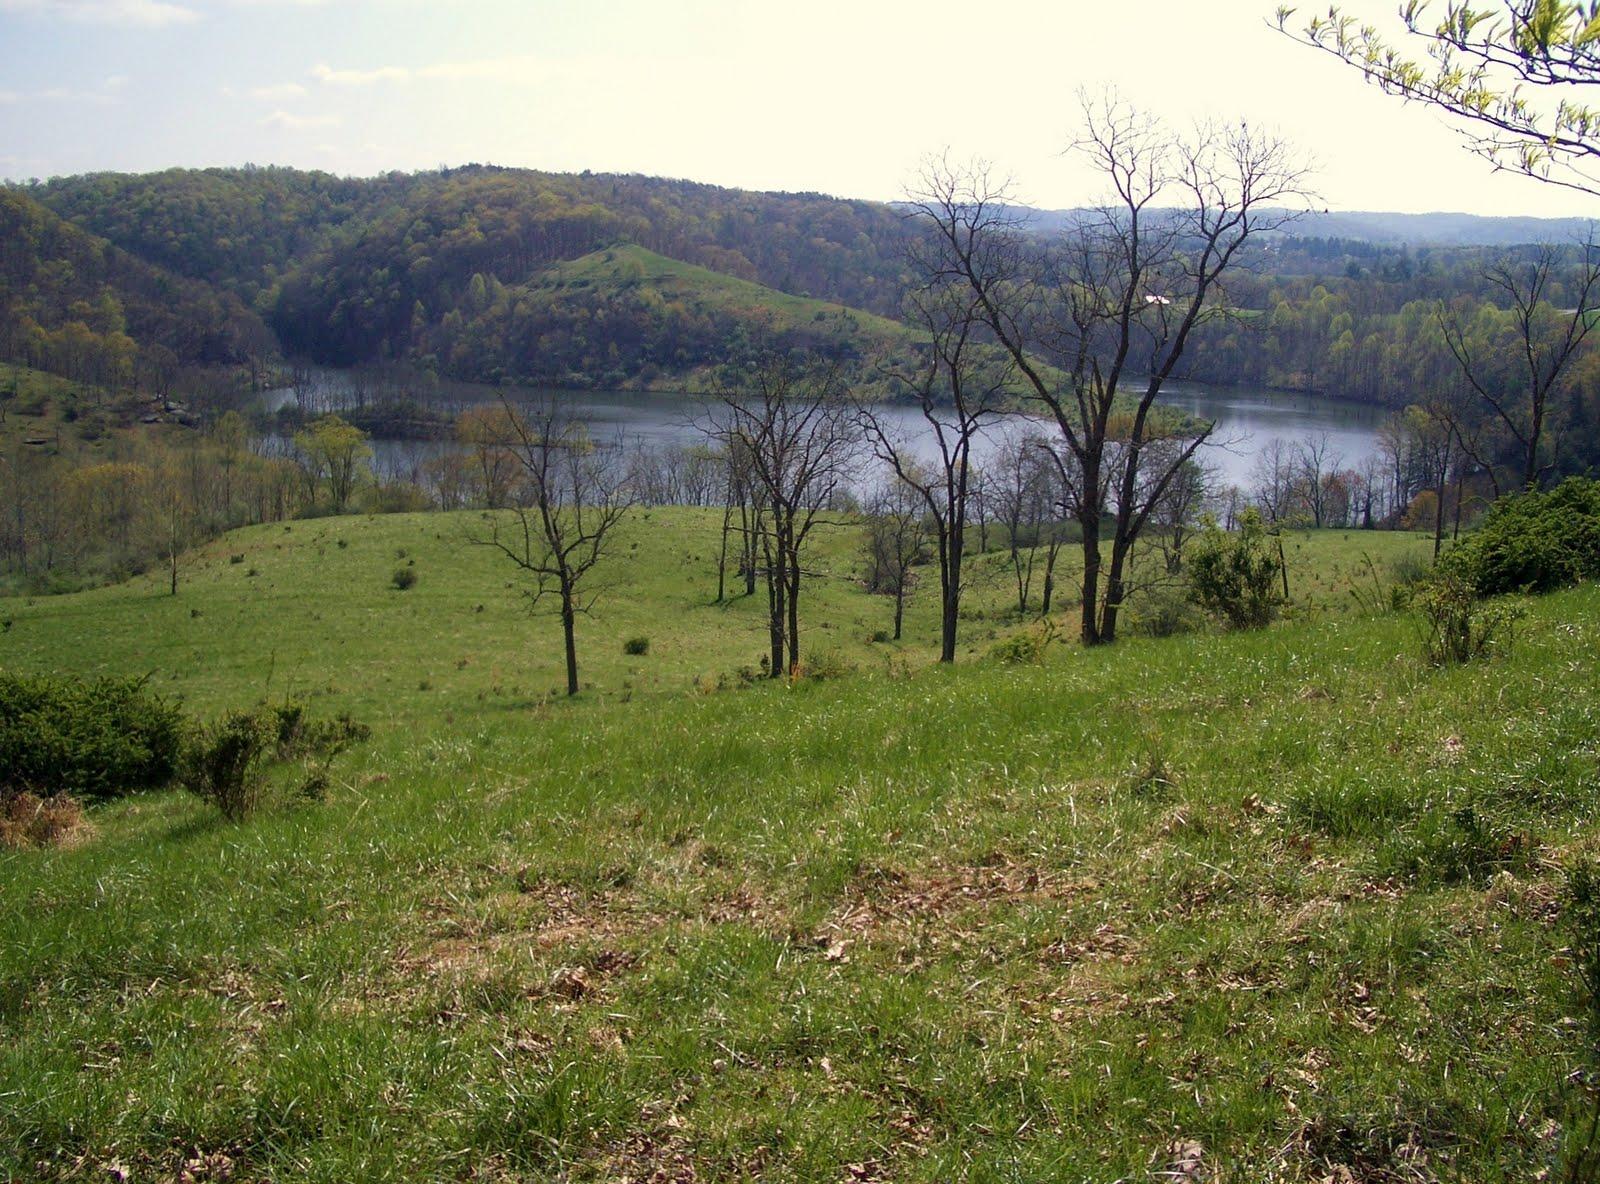 http://1.bp.blogspot.com/_KEqW-2dhfX0/S837mjZ3OyI/AAAAAAAABDc/5OZqG61Td6w/s1600/Lake+View+1.jpg